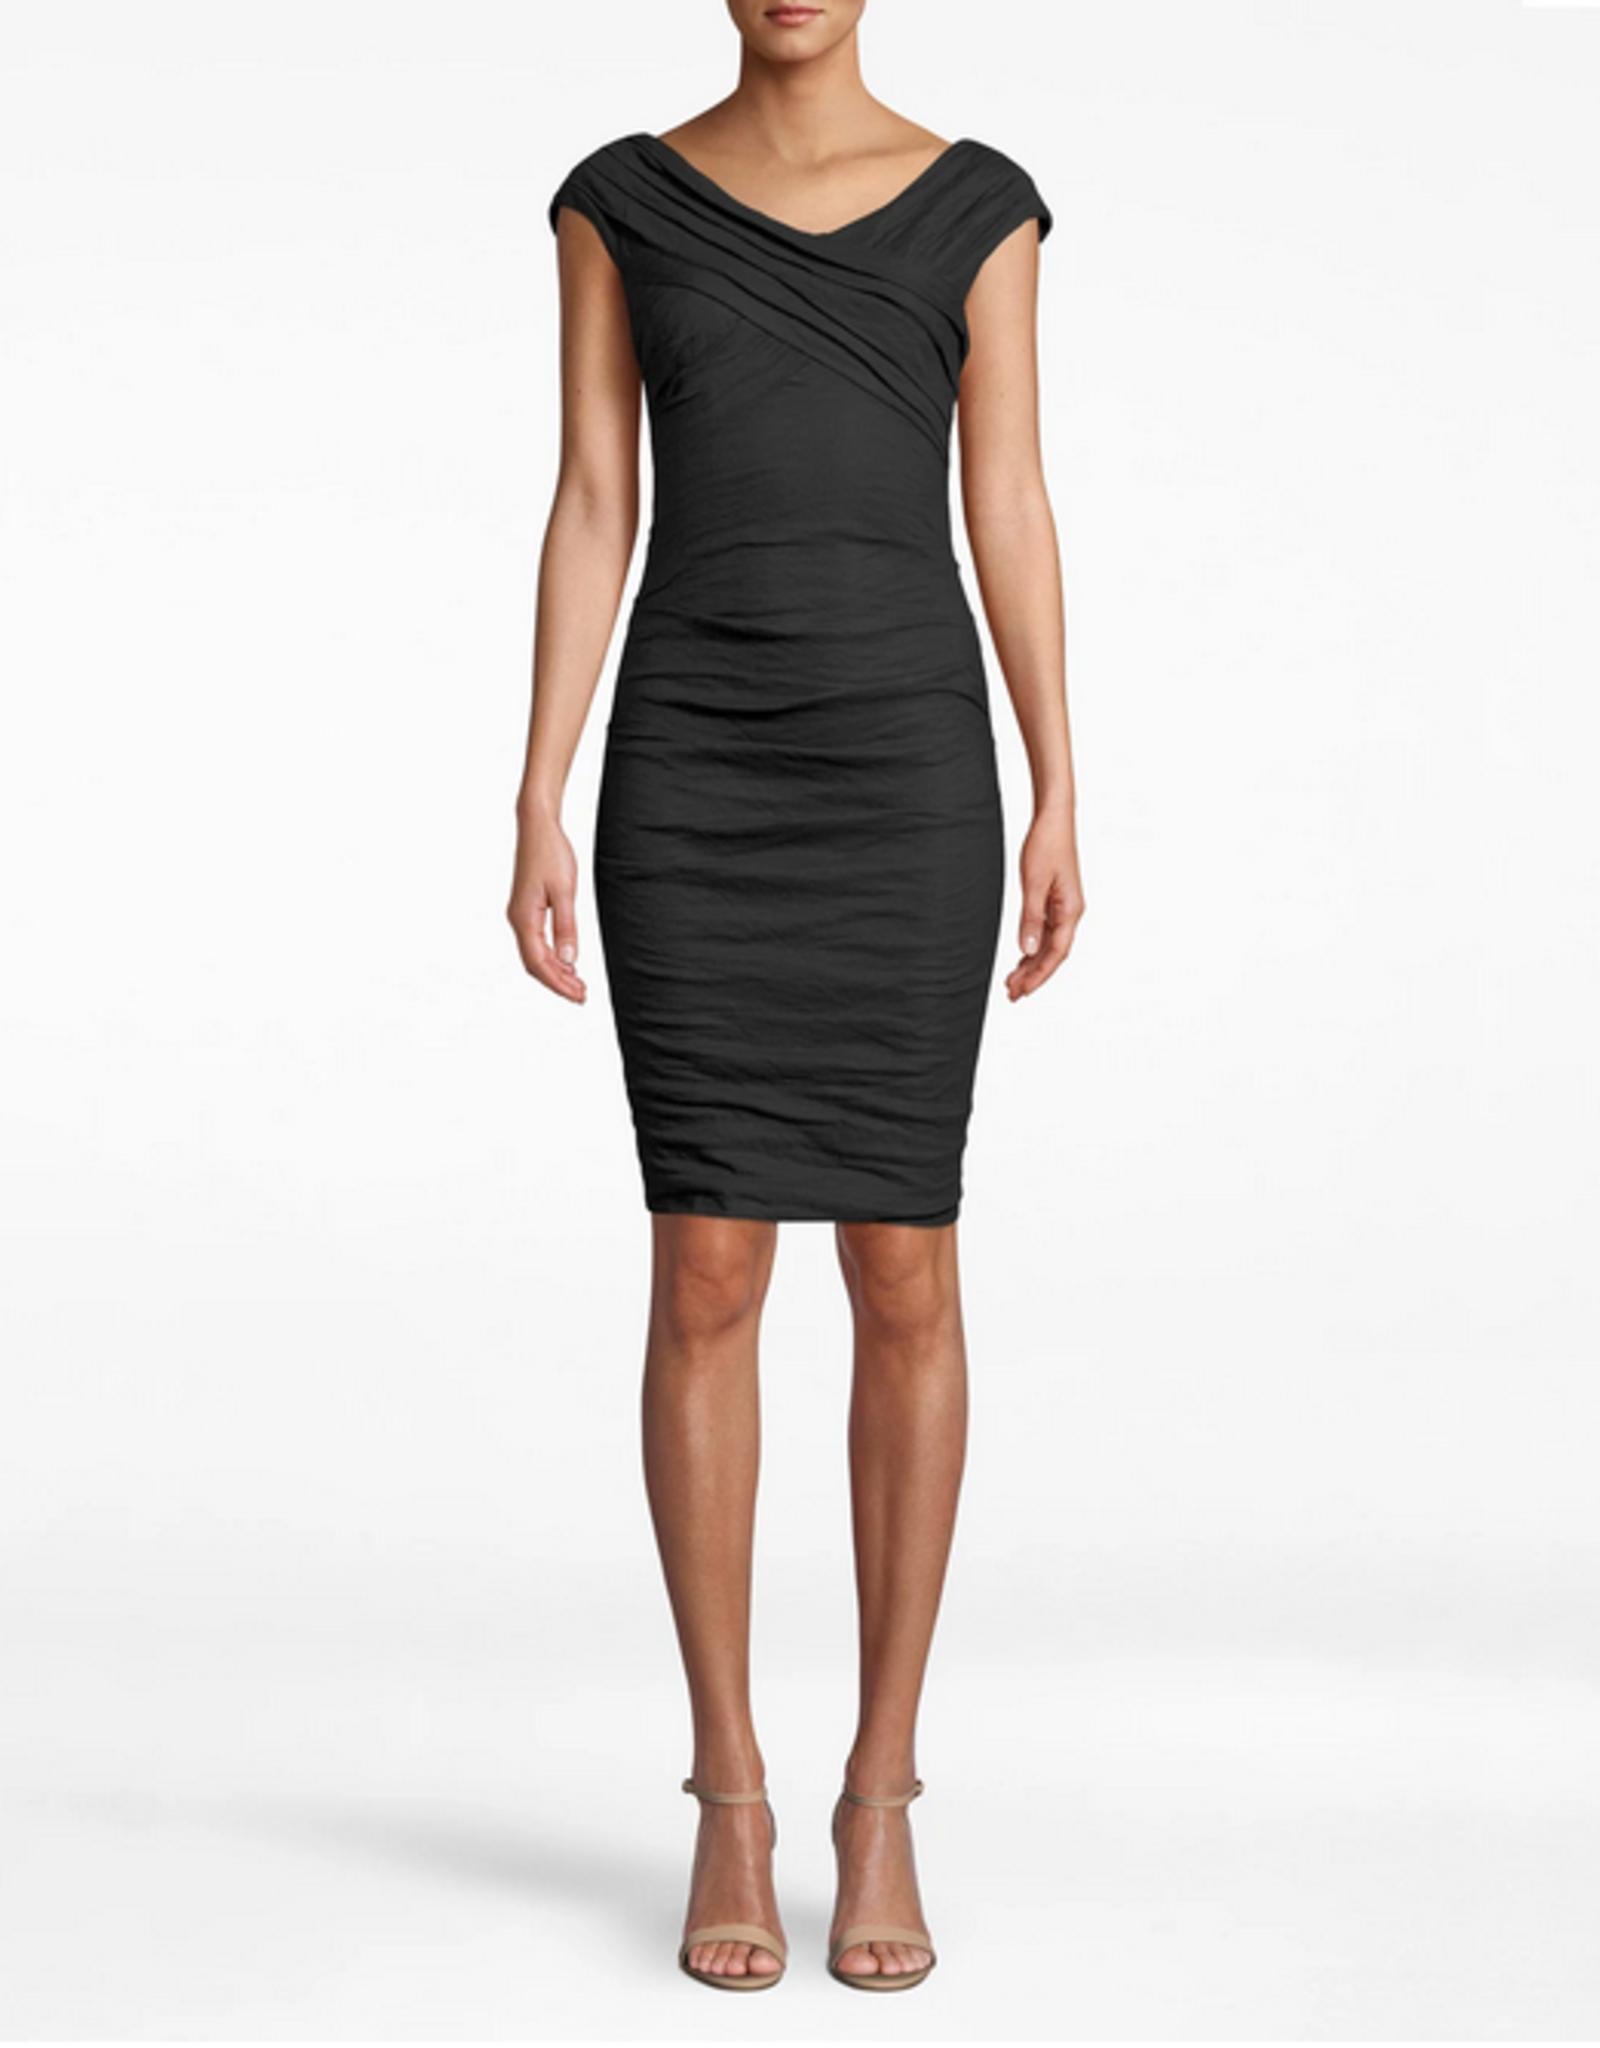 Stewart Cotton Metal Dress